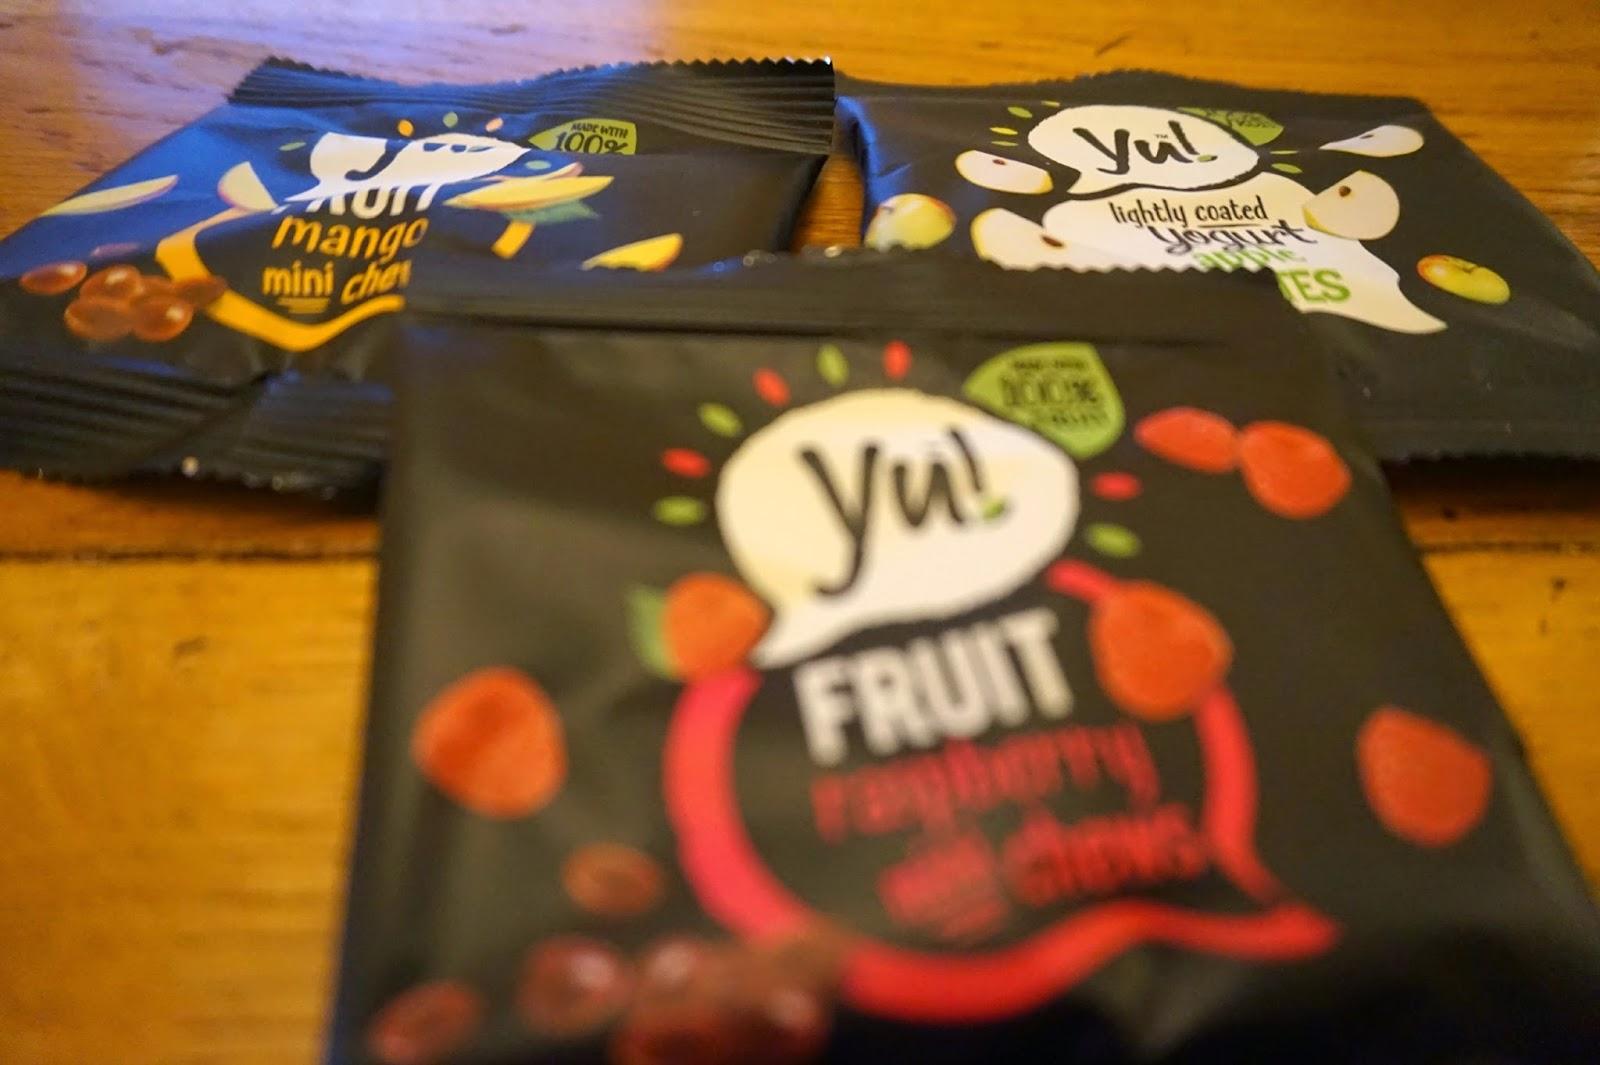 Yu Fruit